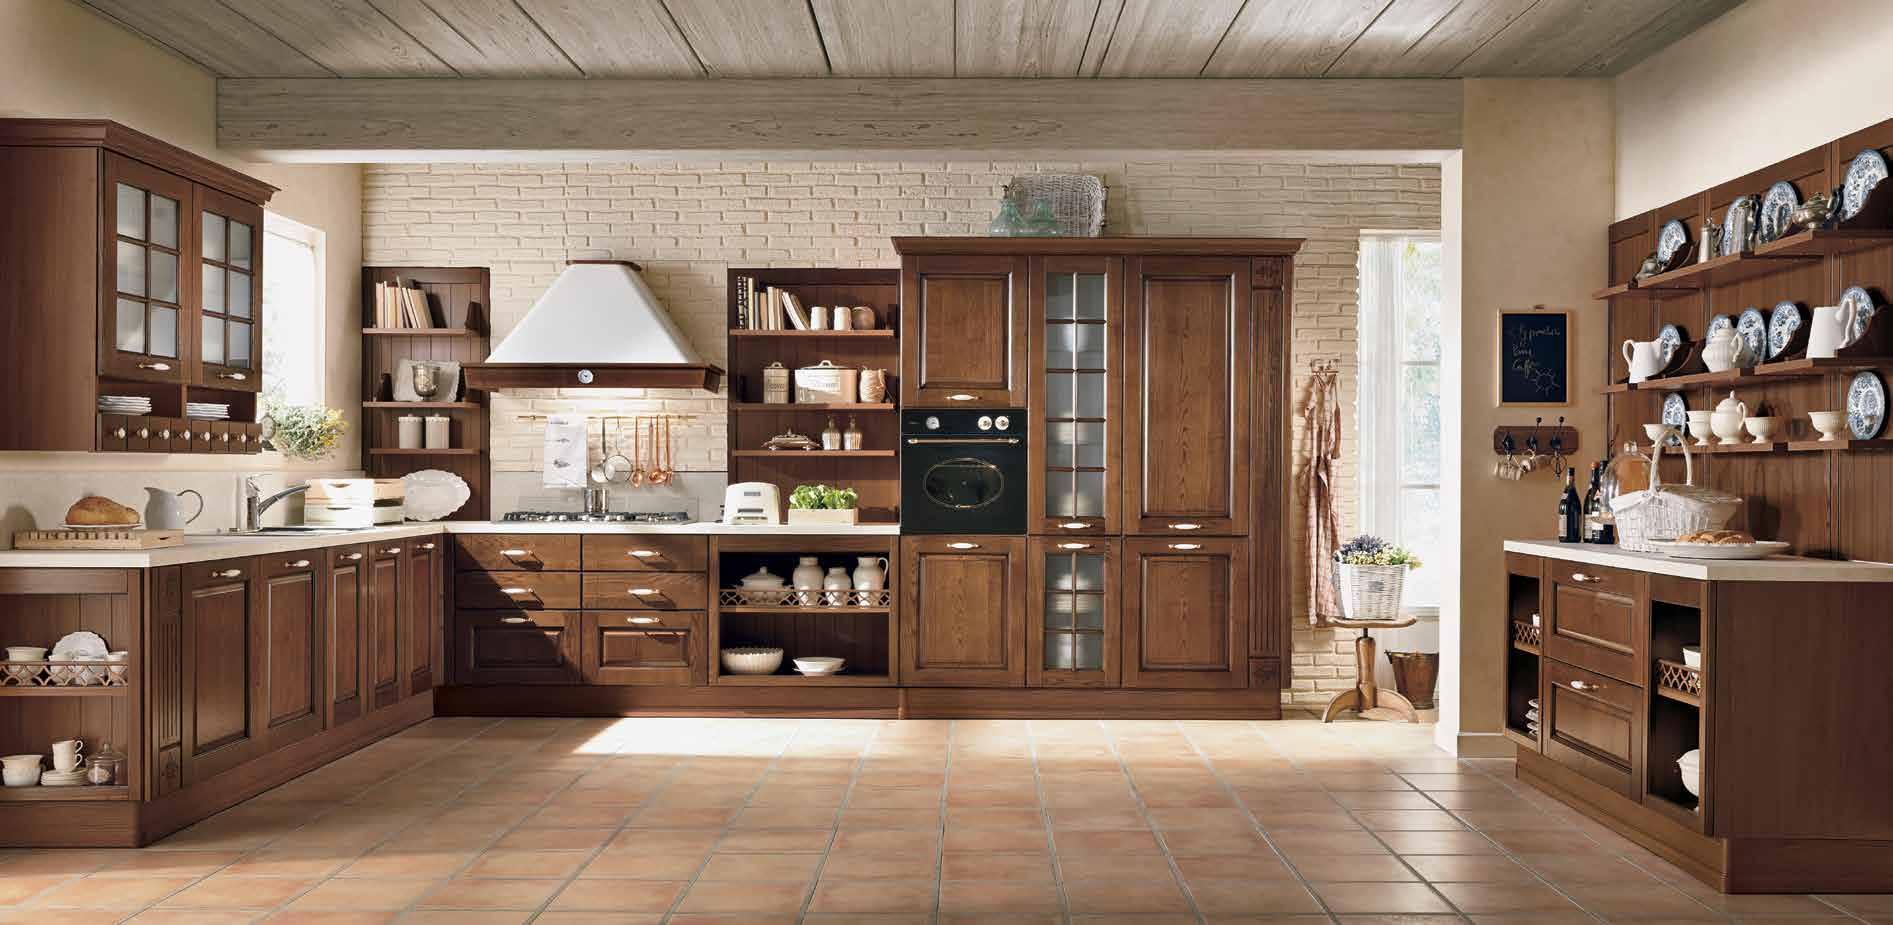 Armonia μασιφ κουζινα με απορροφητηρα καμιναδα λεπτομερειες